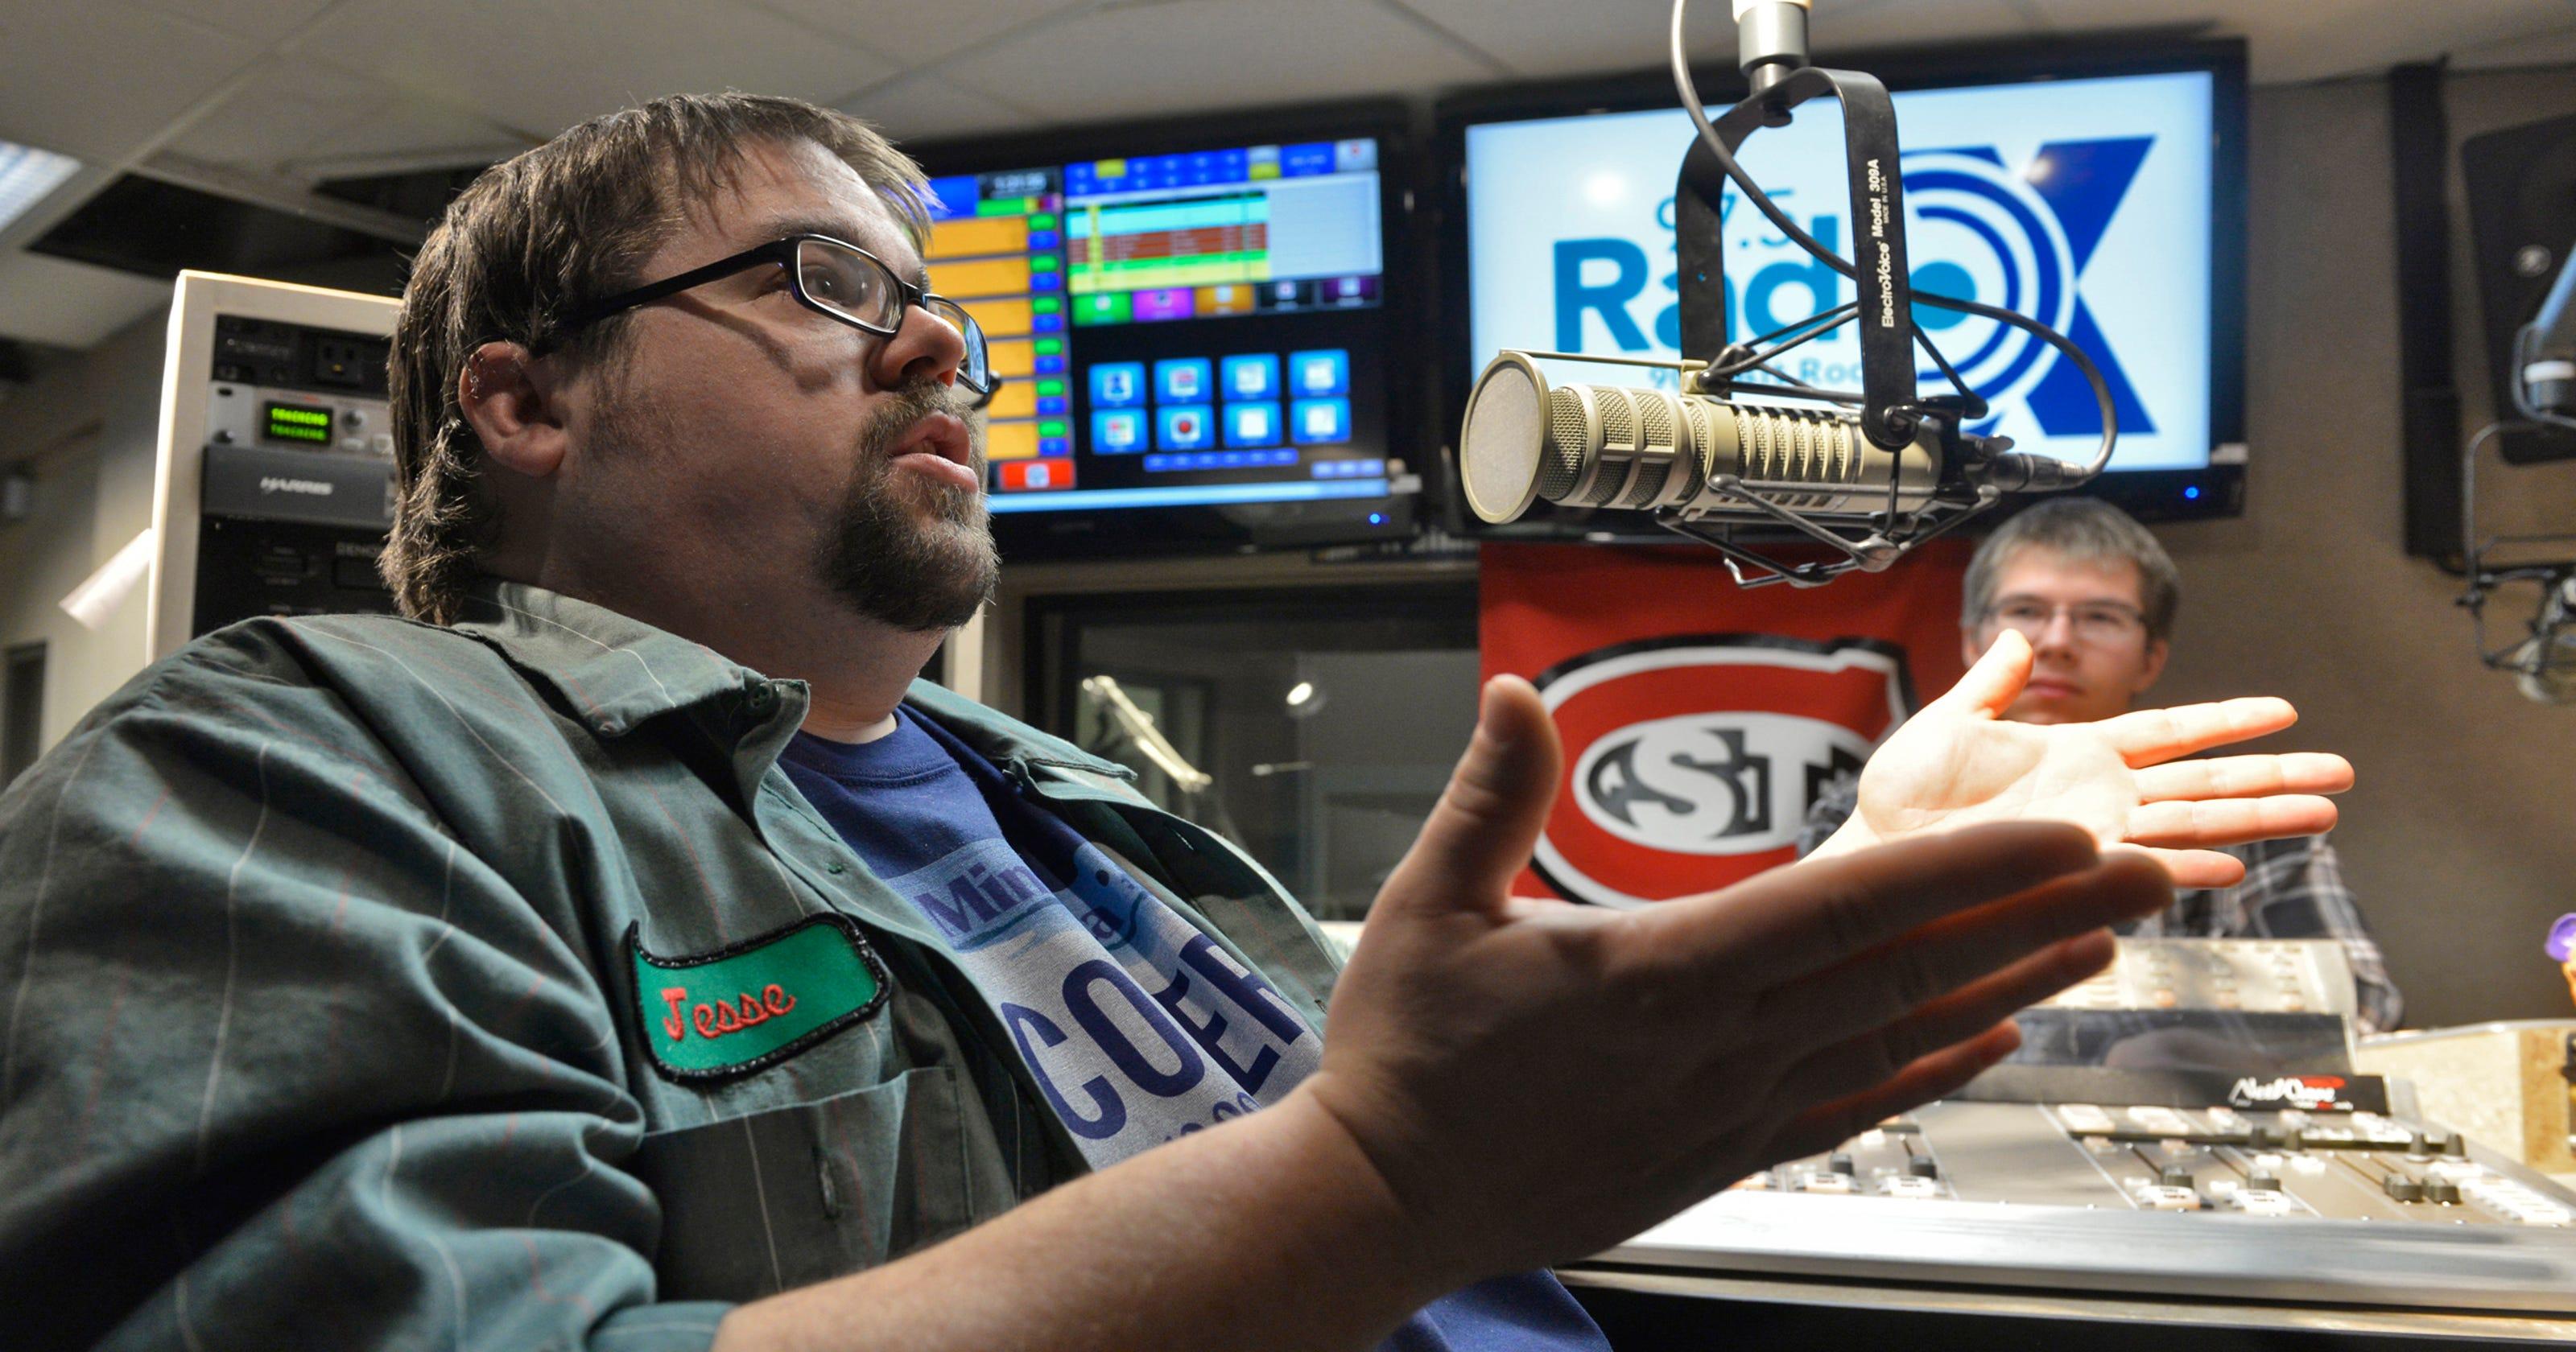 New alt rock radio station debuts Monday